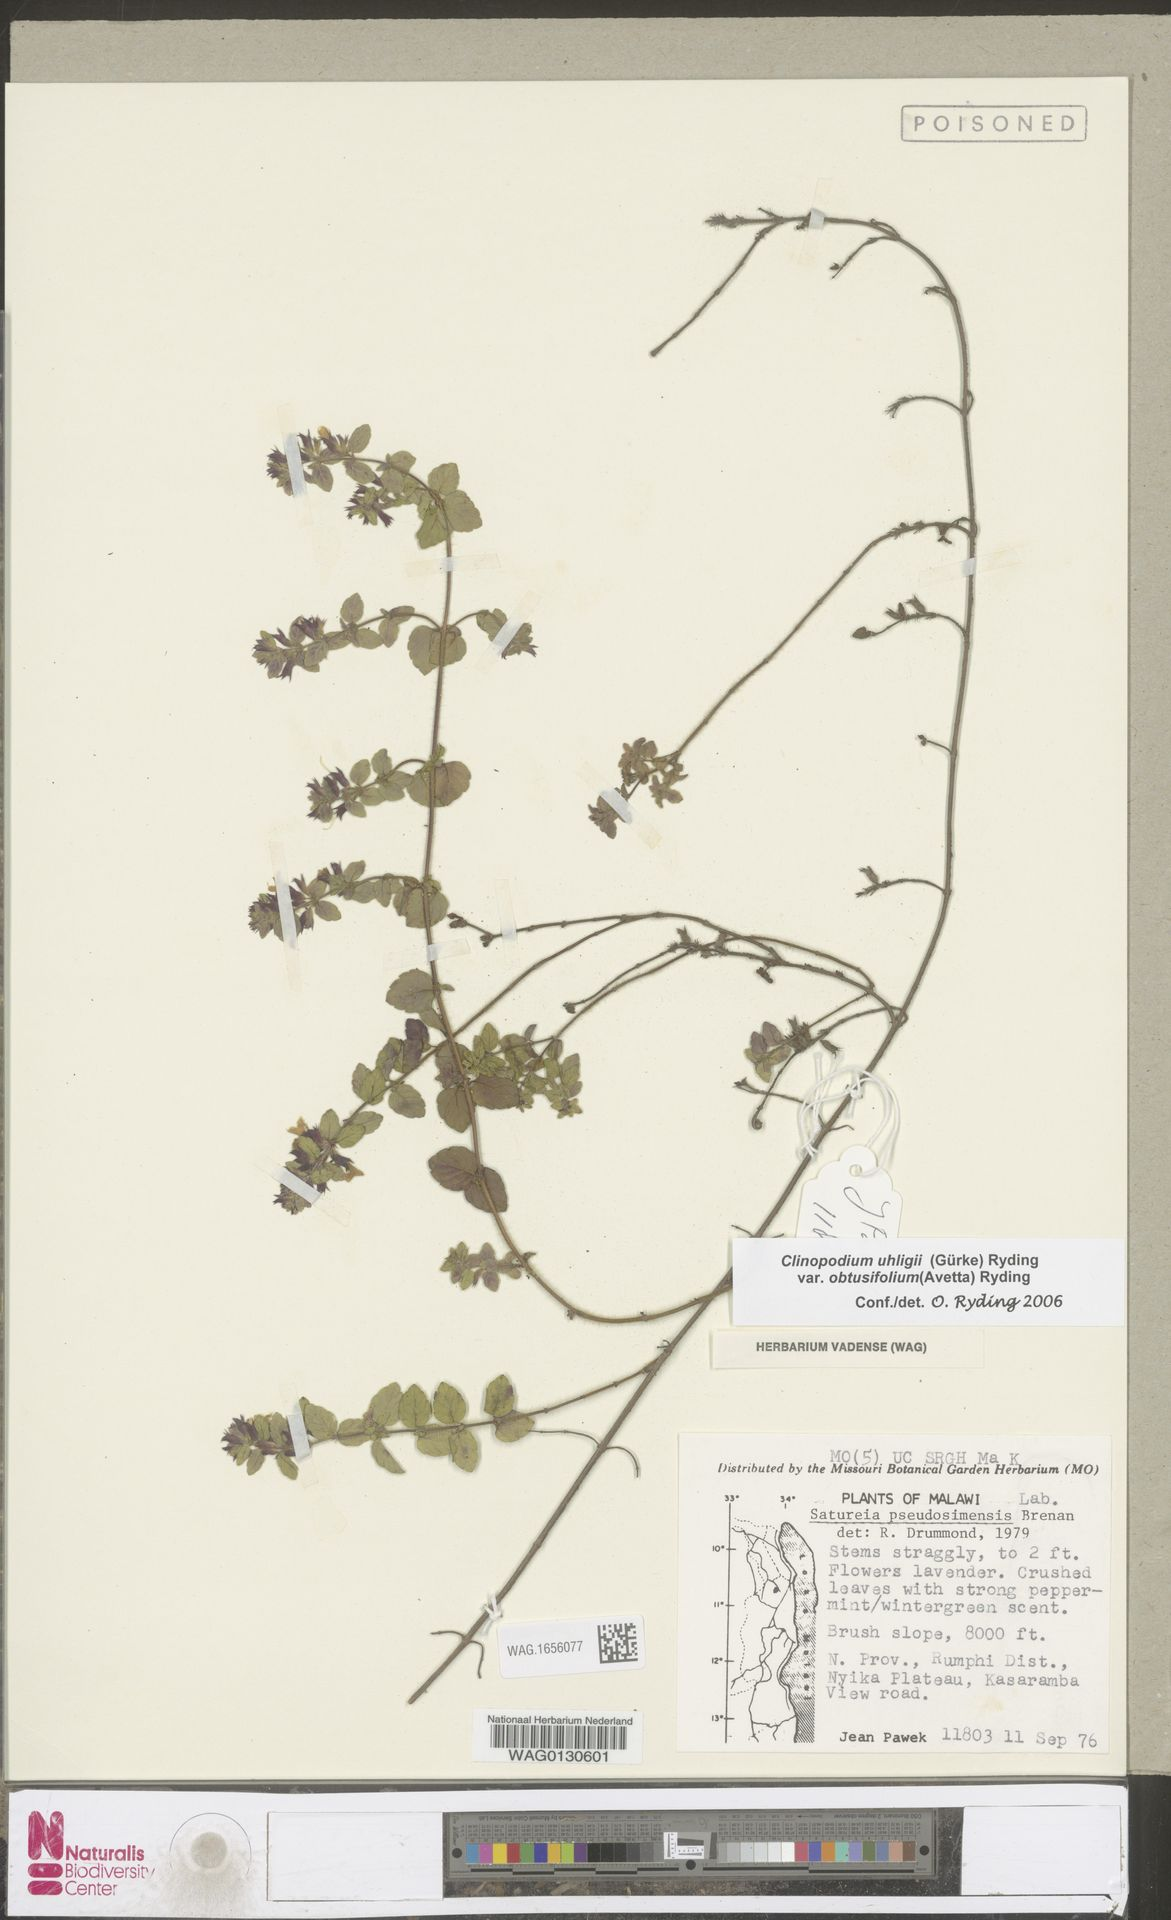 WAG.1656077 | Clinopodium uhligii var. obtusifolium (Avetta) Ryding